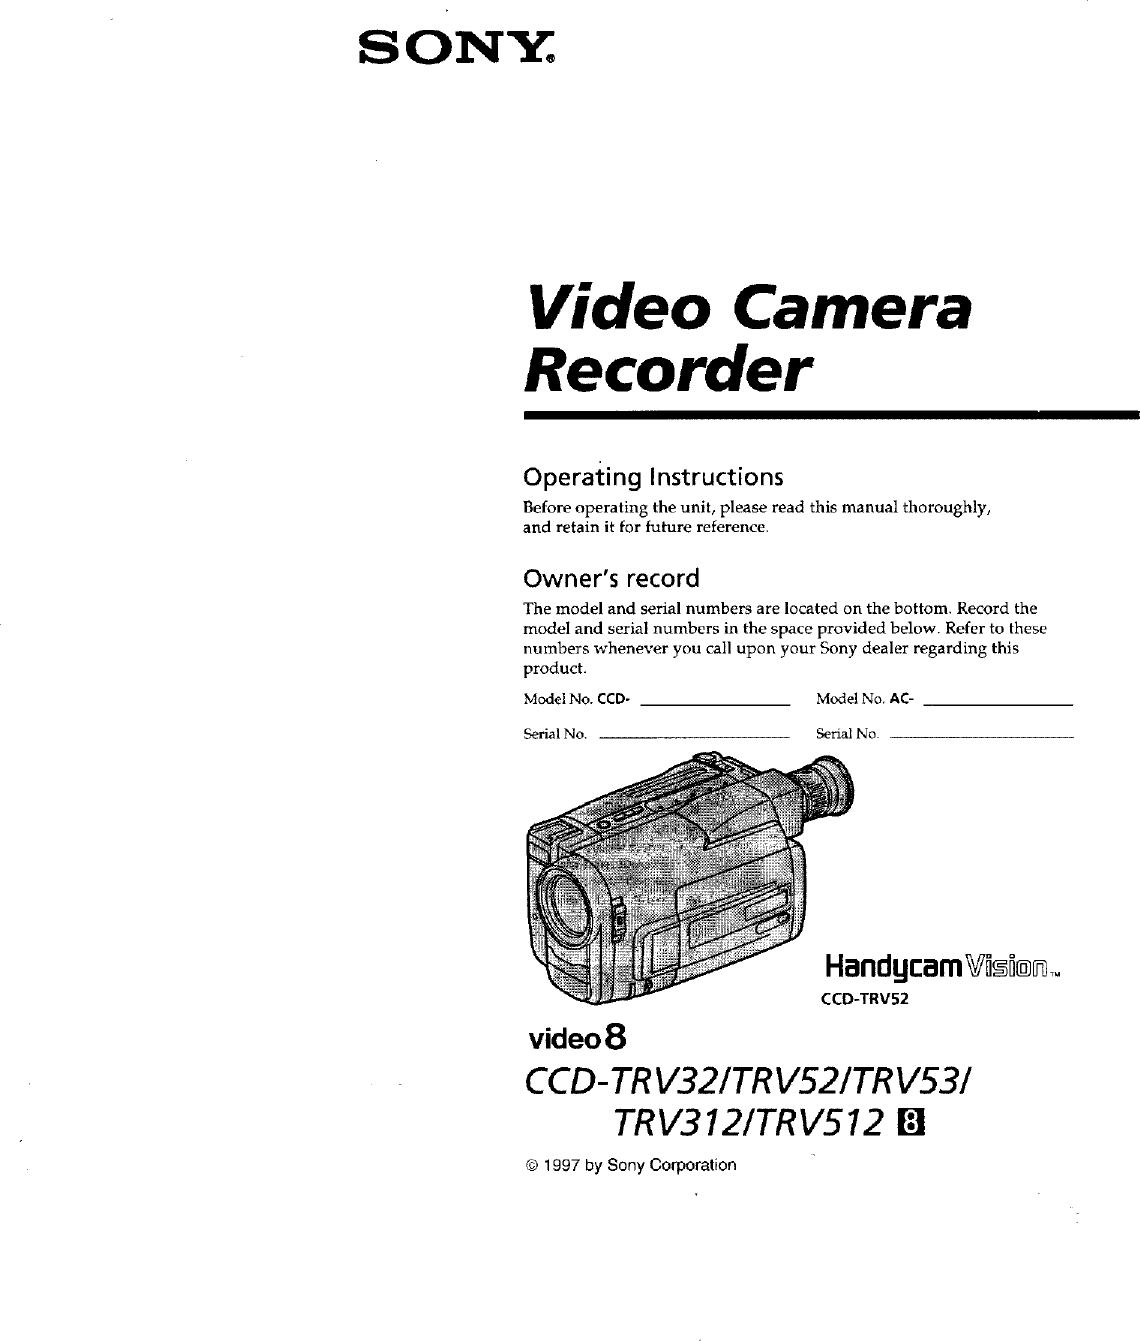 Sony CCD TRV312 User Manual VIDEO CAMERA RECORDER Manuals